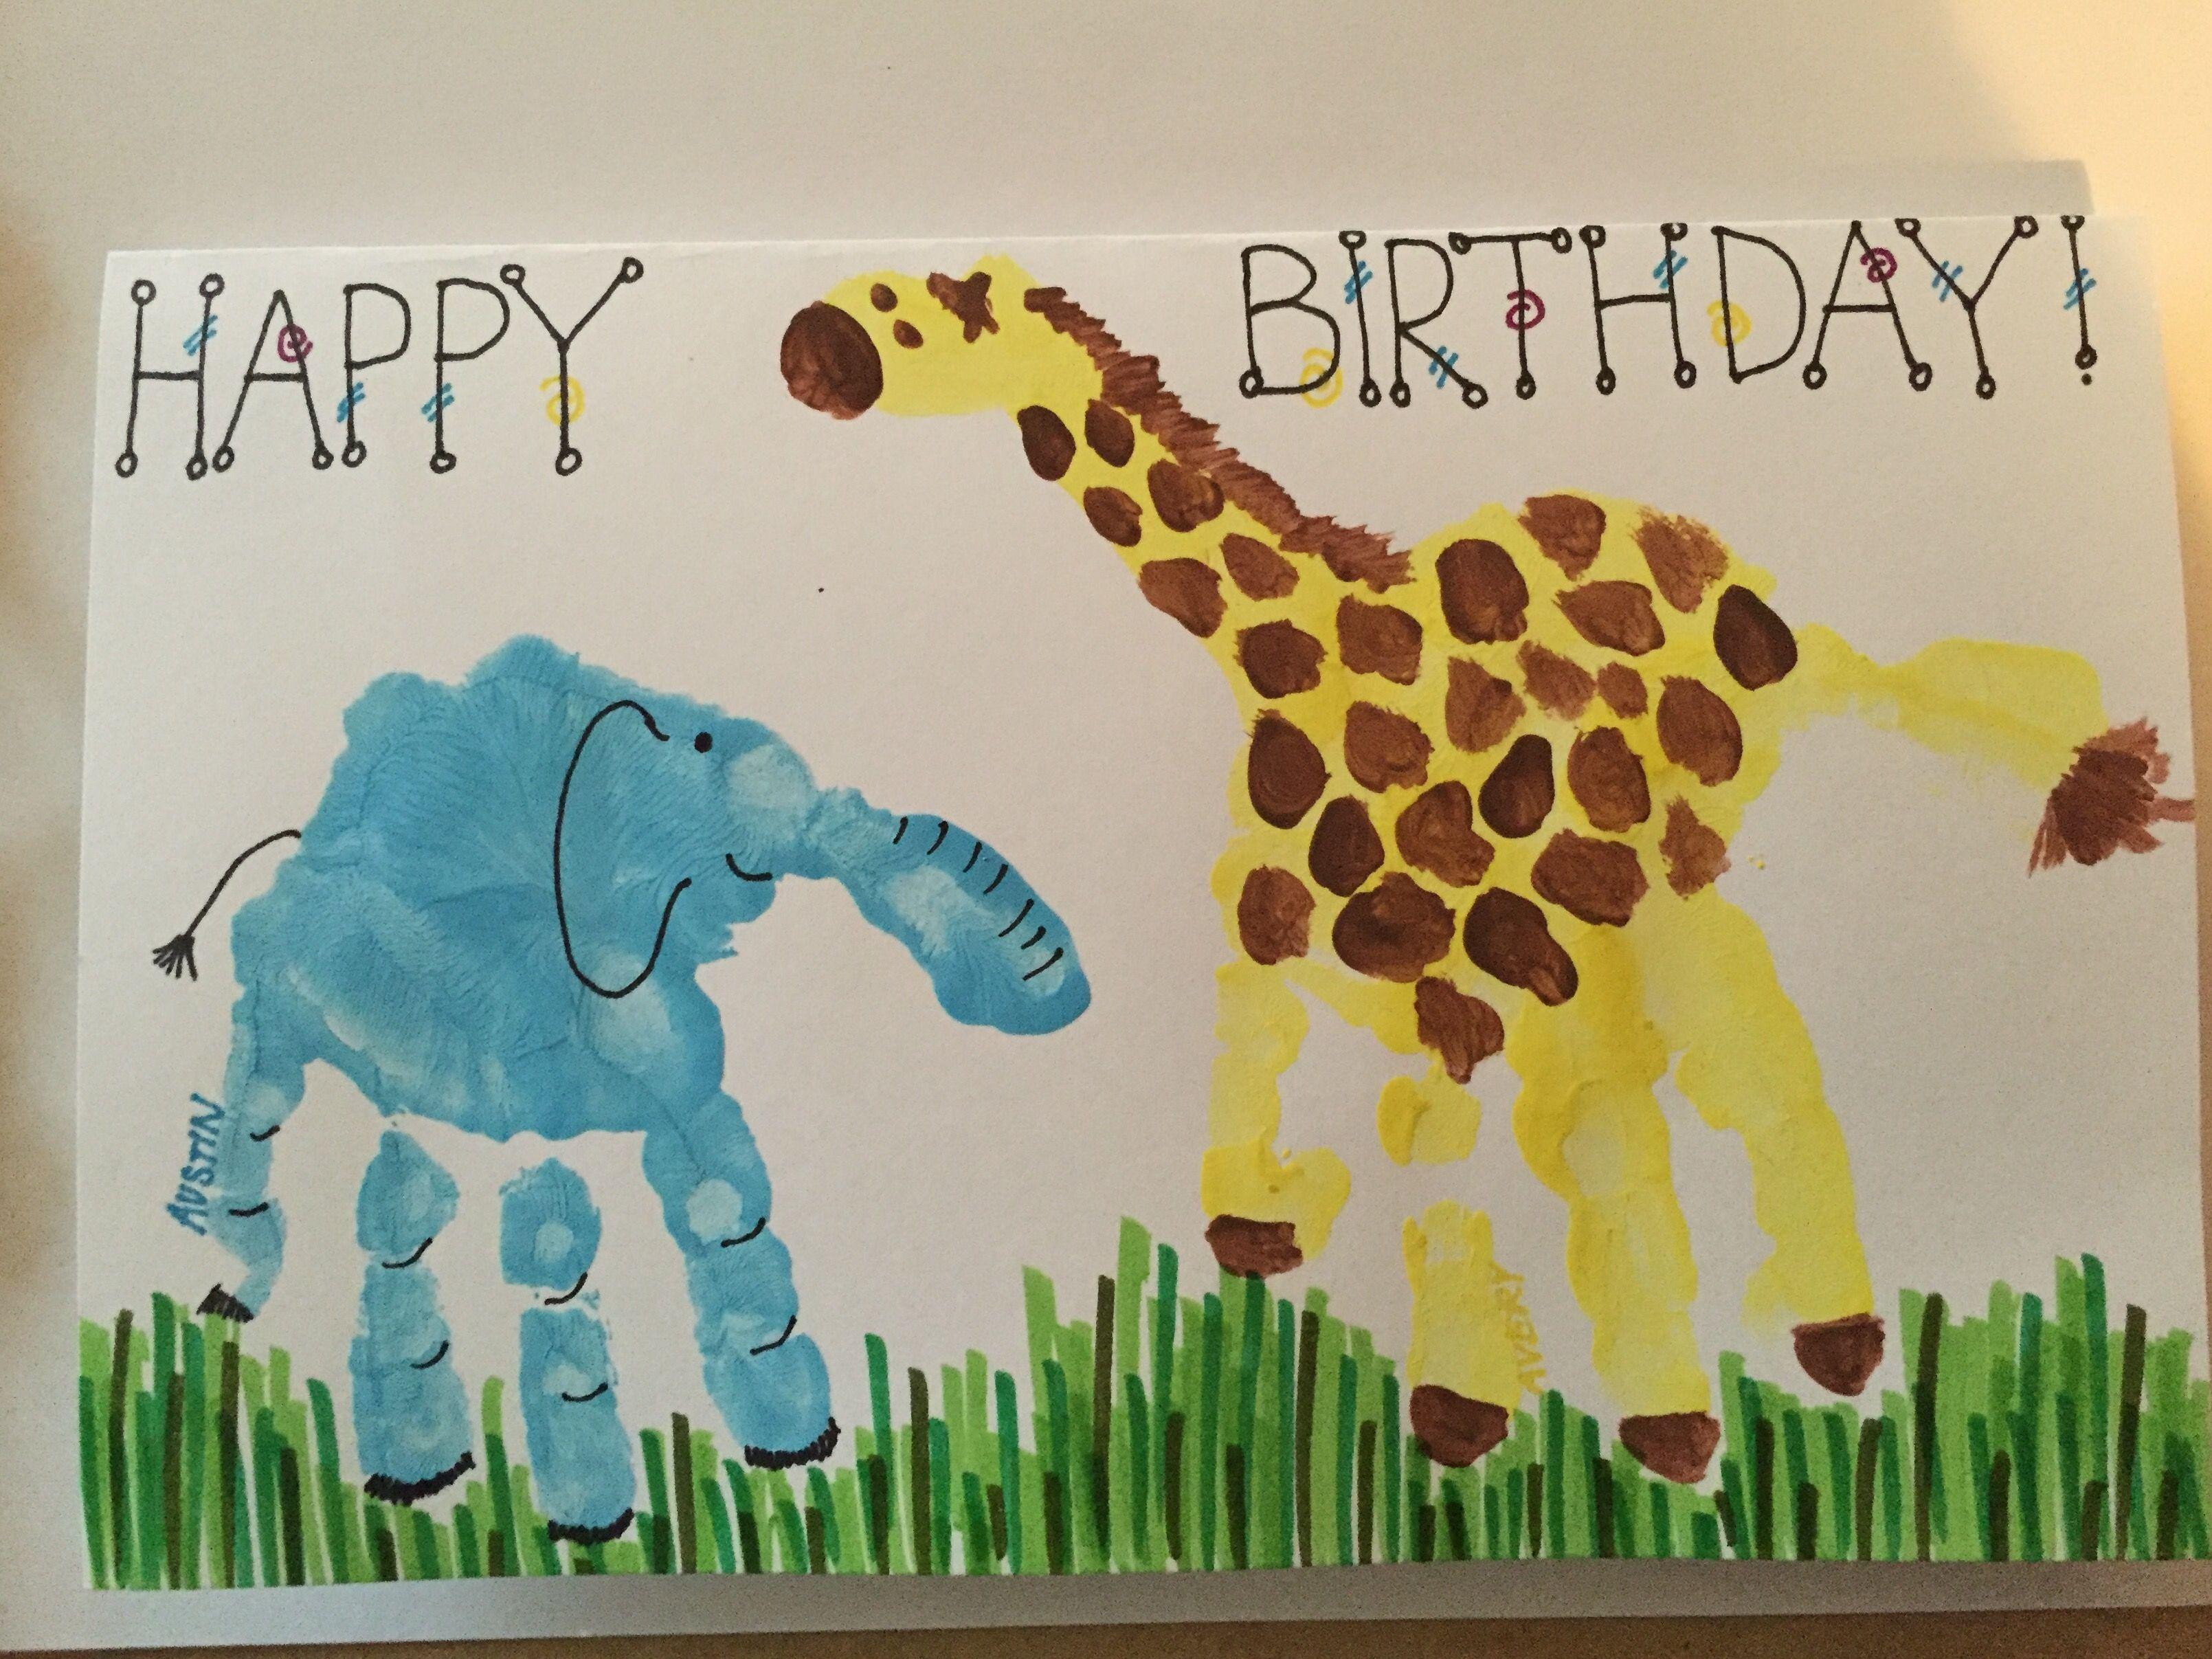 Handprint Animal Birthday Card Handprint Giraffe And Handprint Elephant Hand Print Animals Crafty Gifts Homemade Cards